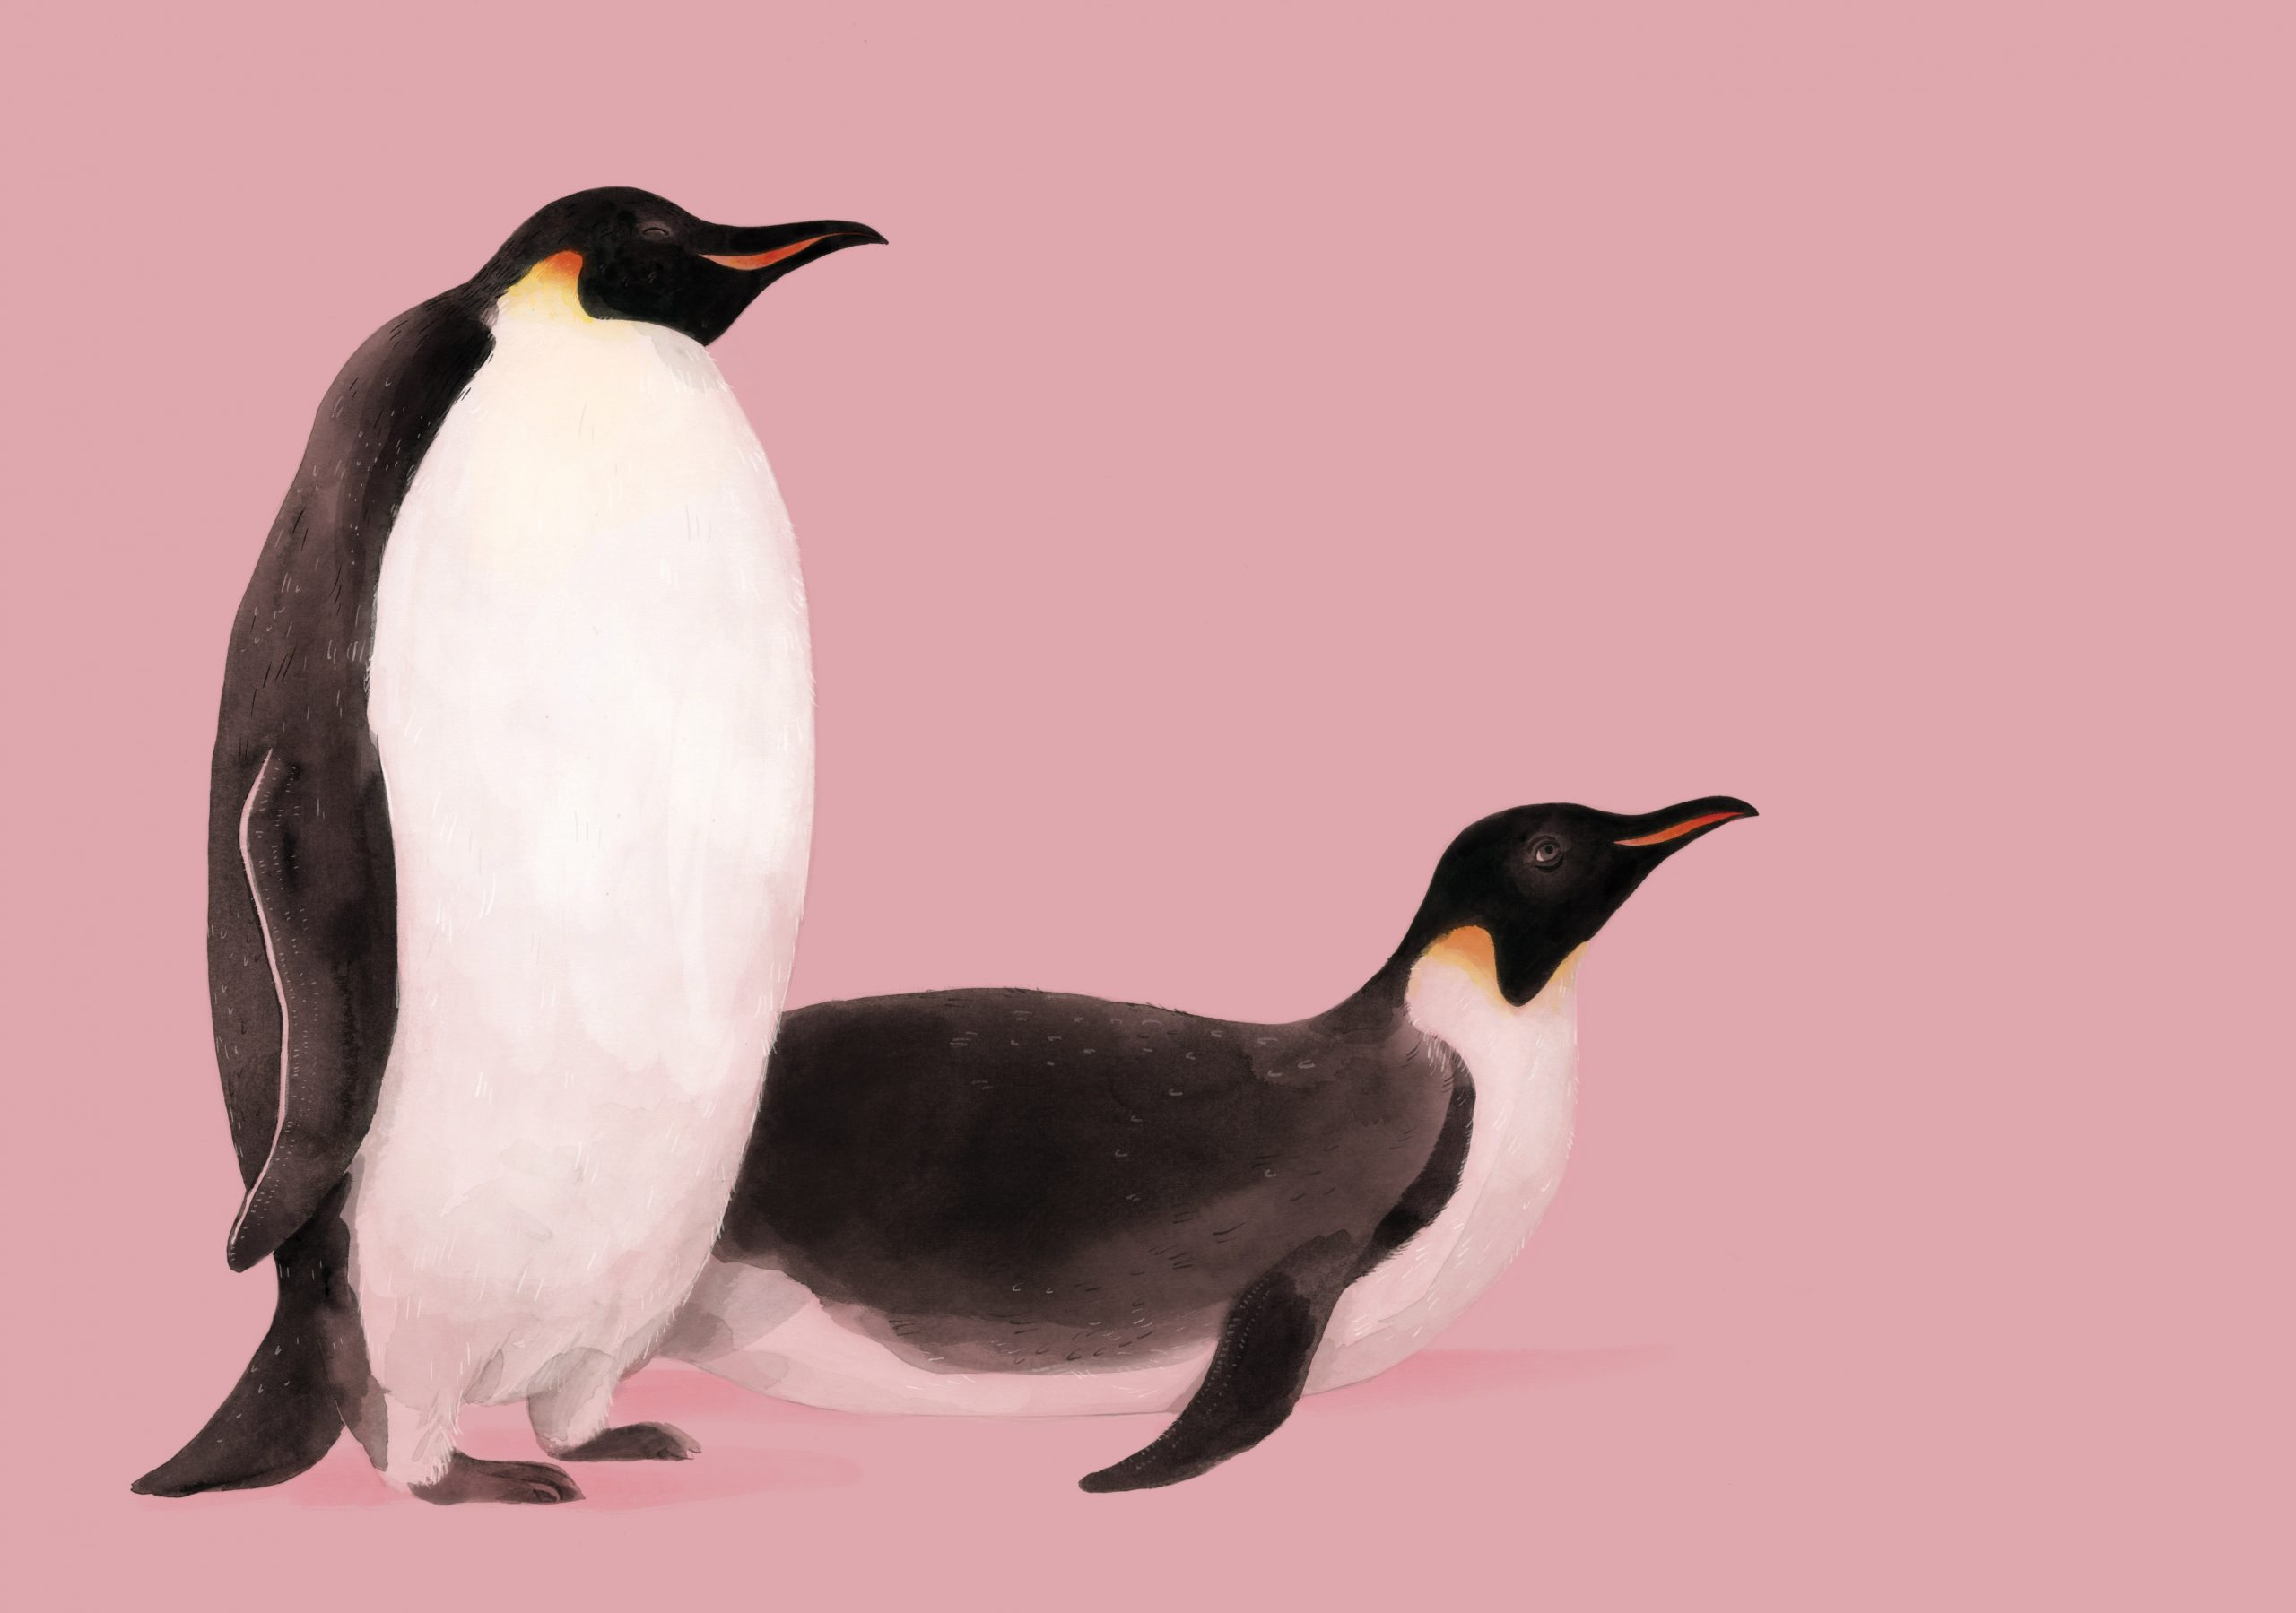 1_Portret_Pinguins